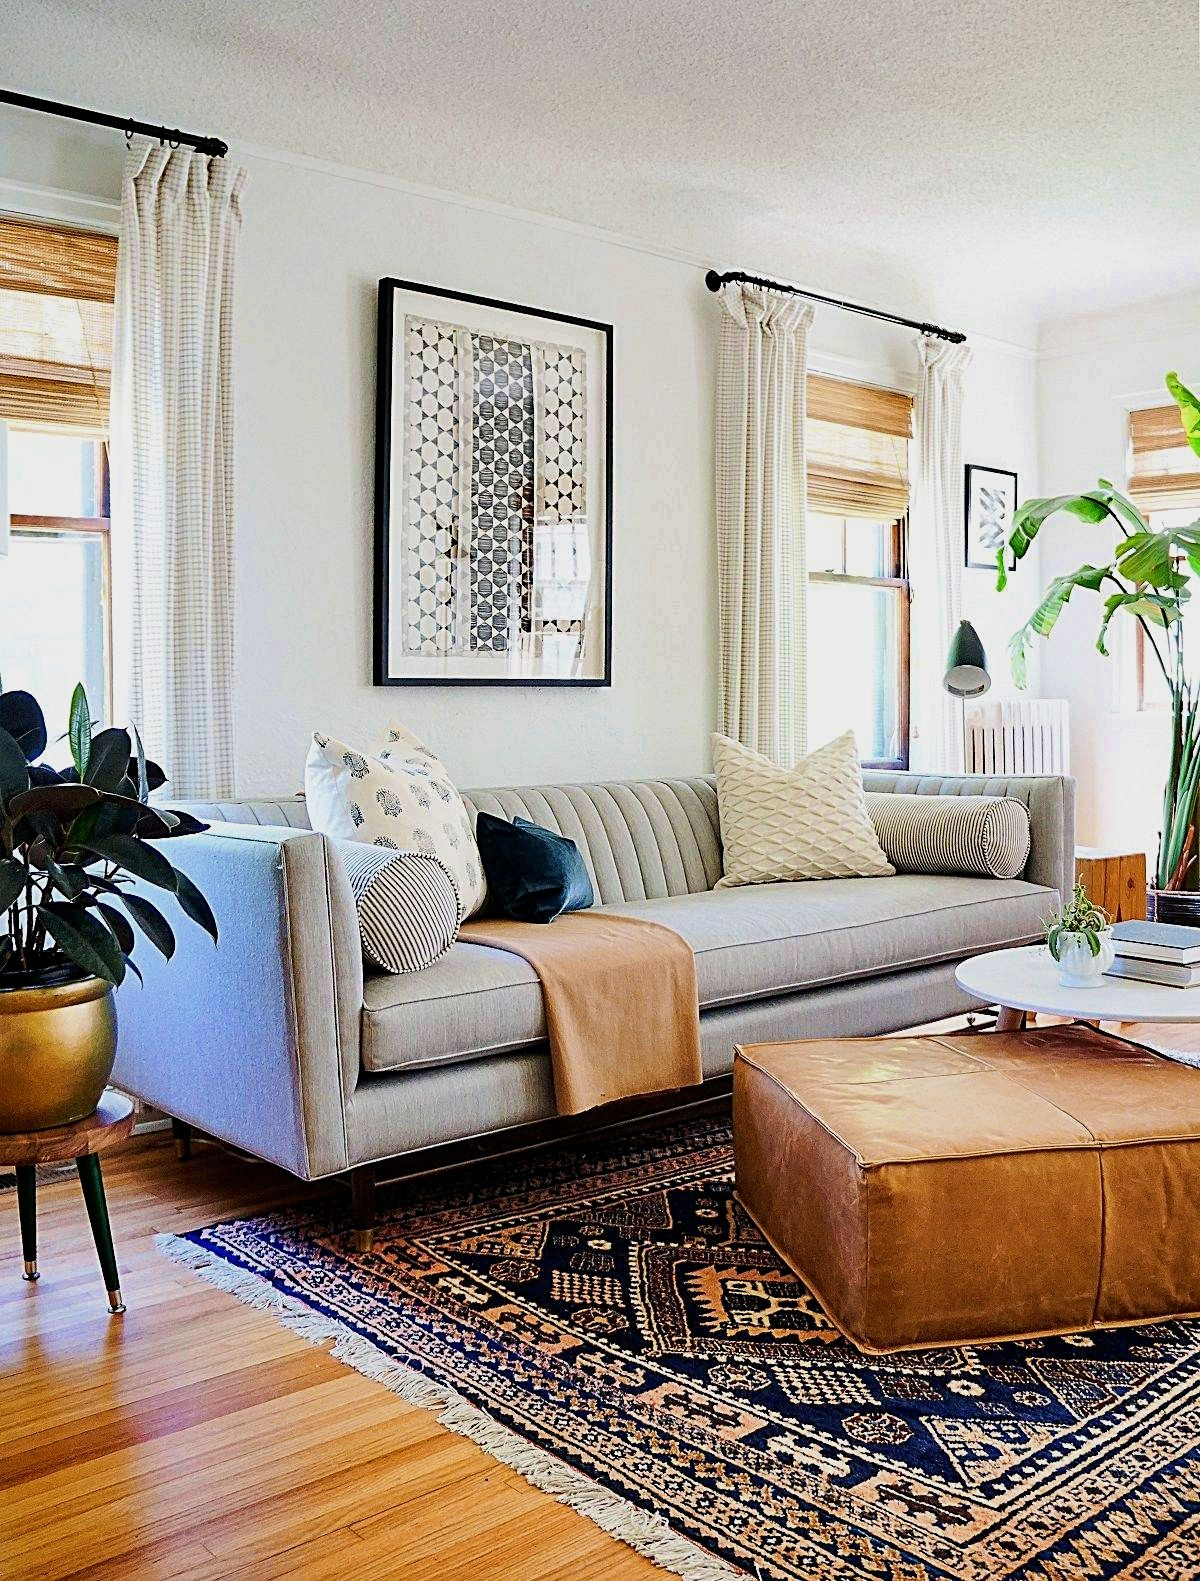 101 Tropical Style Living Room Ideas Photos Living Room Design Modern Minimalist Living Room Minimalist Living Room Design